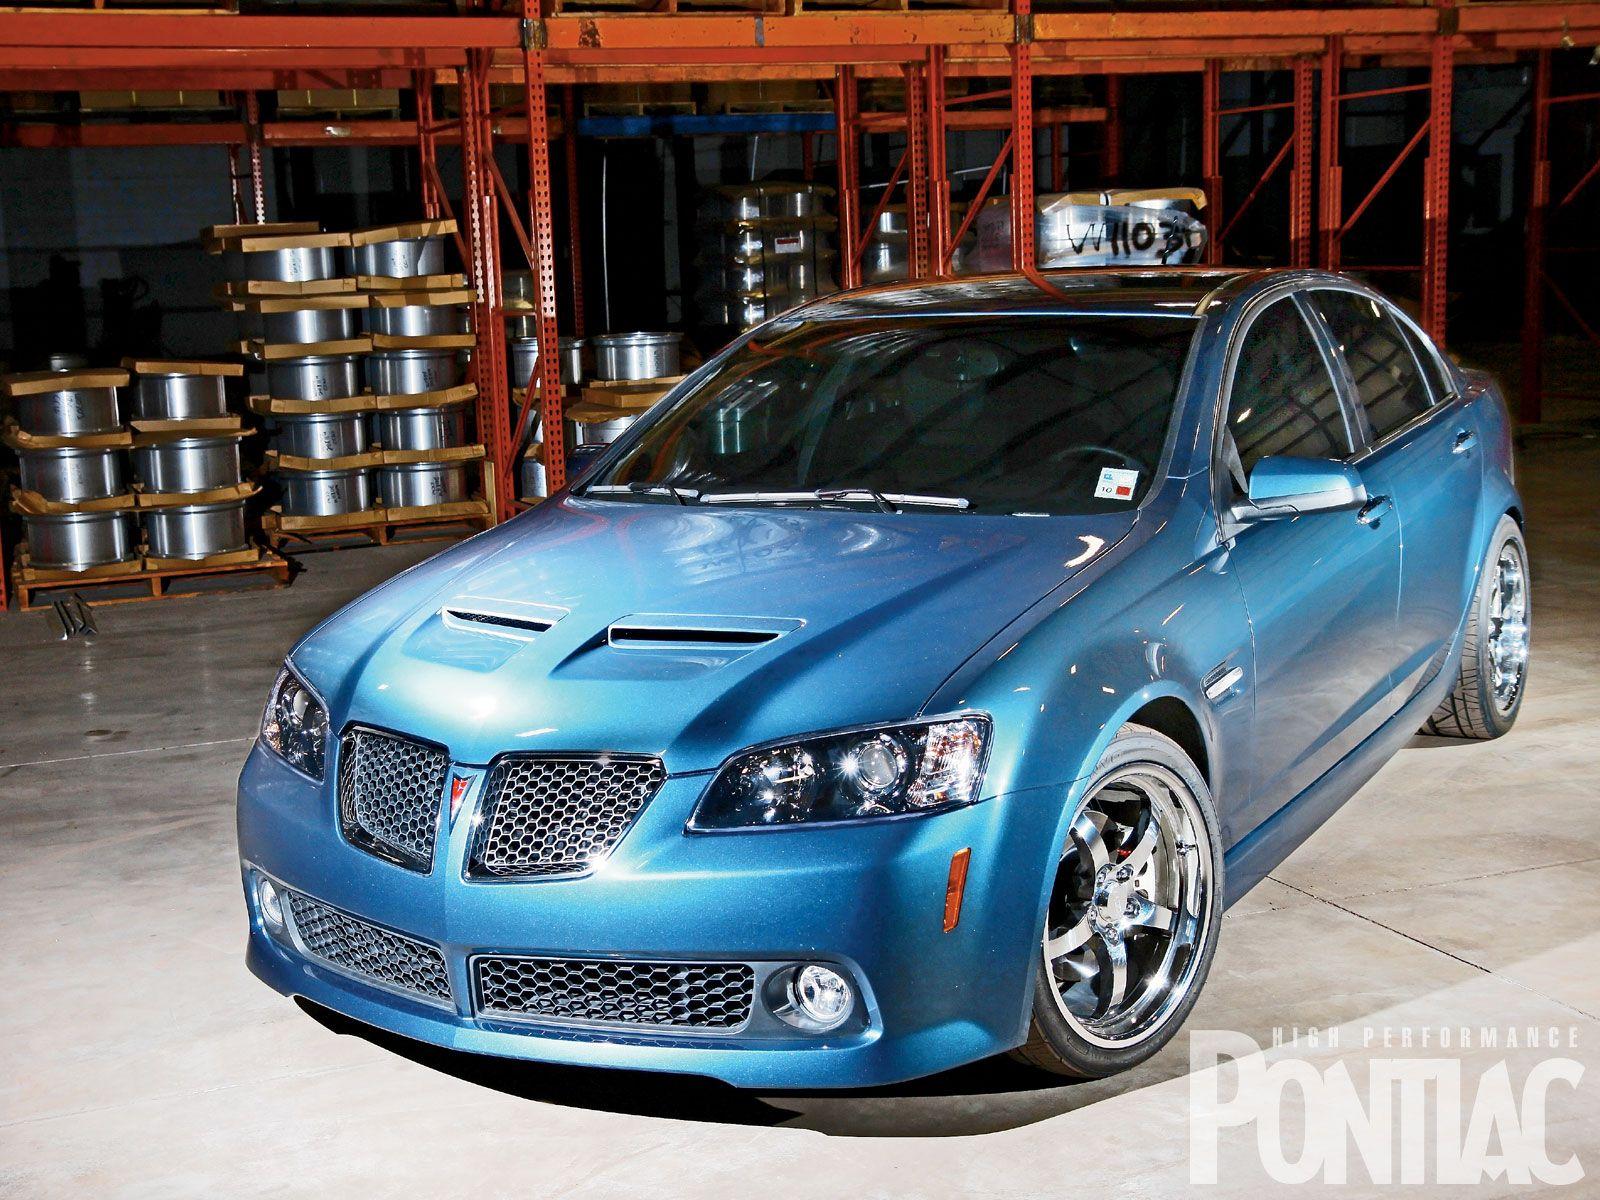 2009 Pontiac G8 supercharged | Autos BOP, Cadillac, and Holden ...